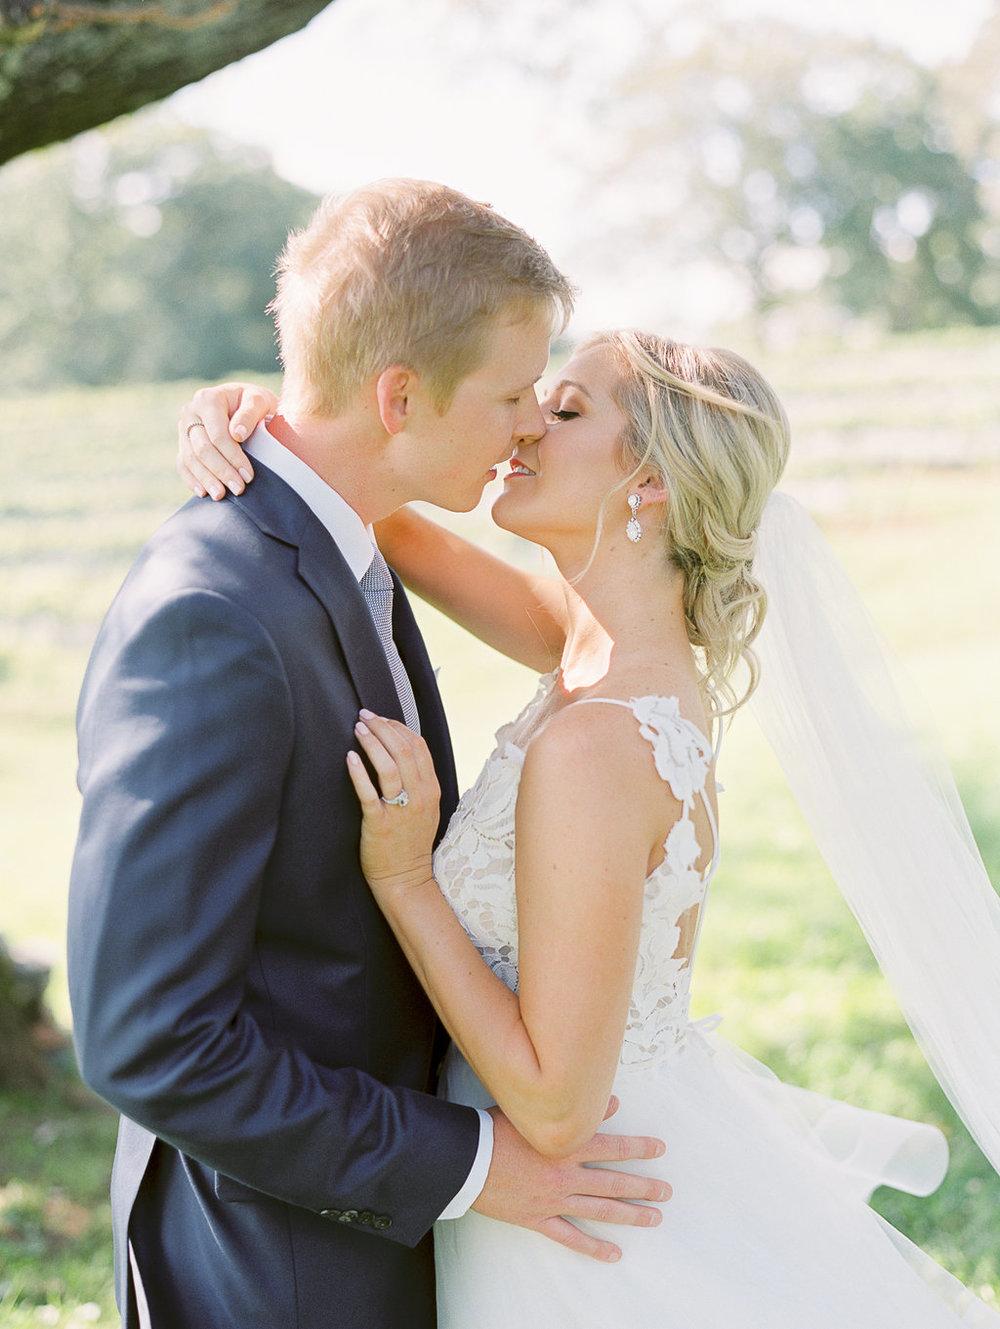 montaluce-winery-dahlonega-atlanta-wedding-photographer-fine-art-film-hannah-forsberg18.JPG